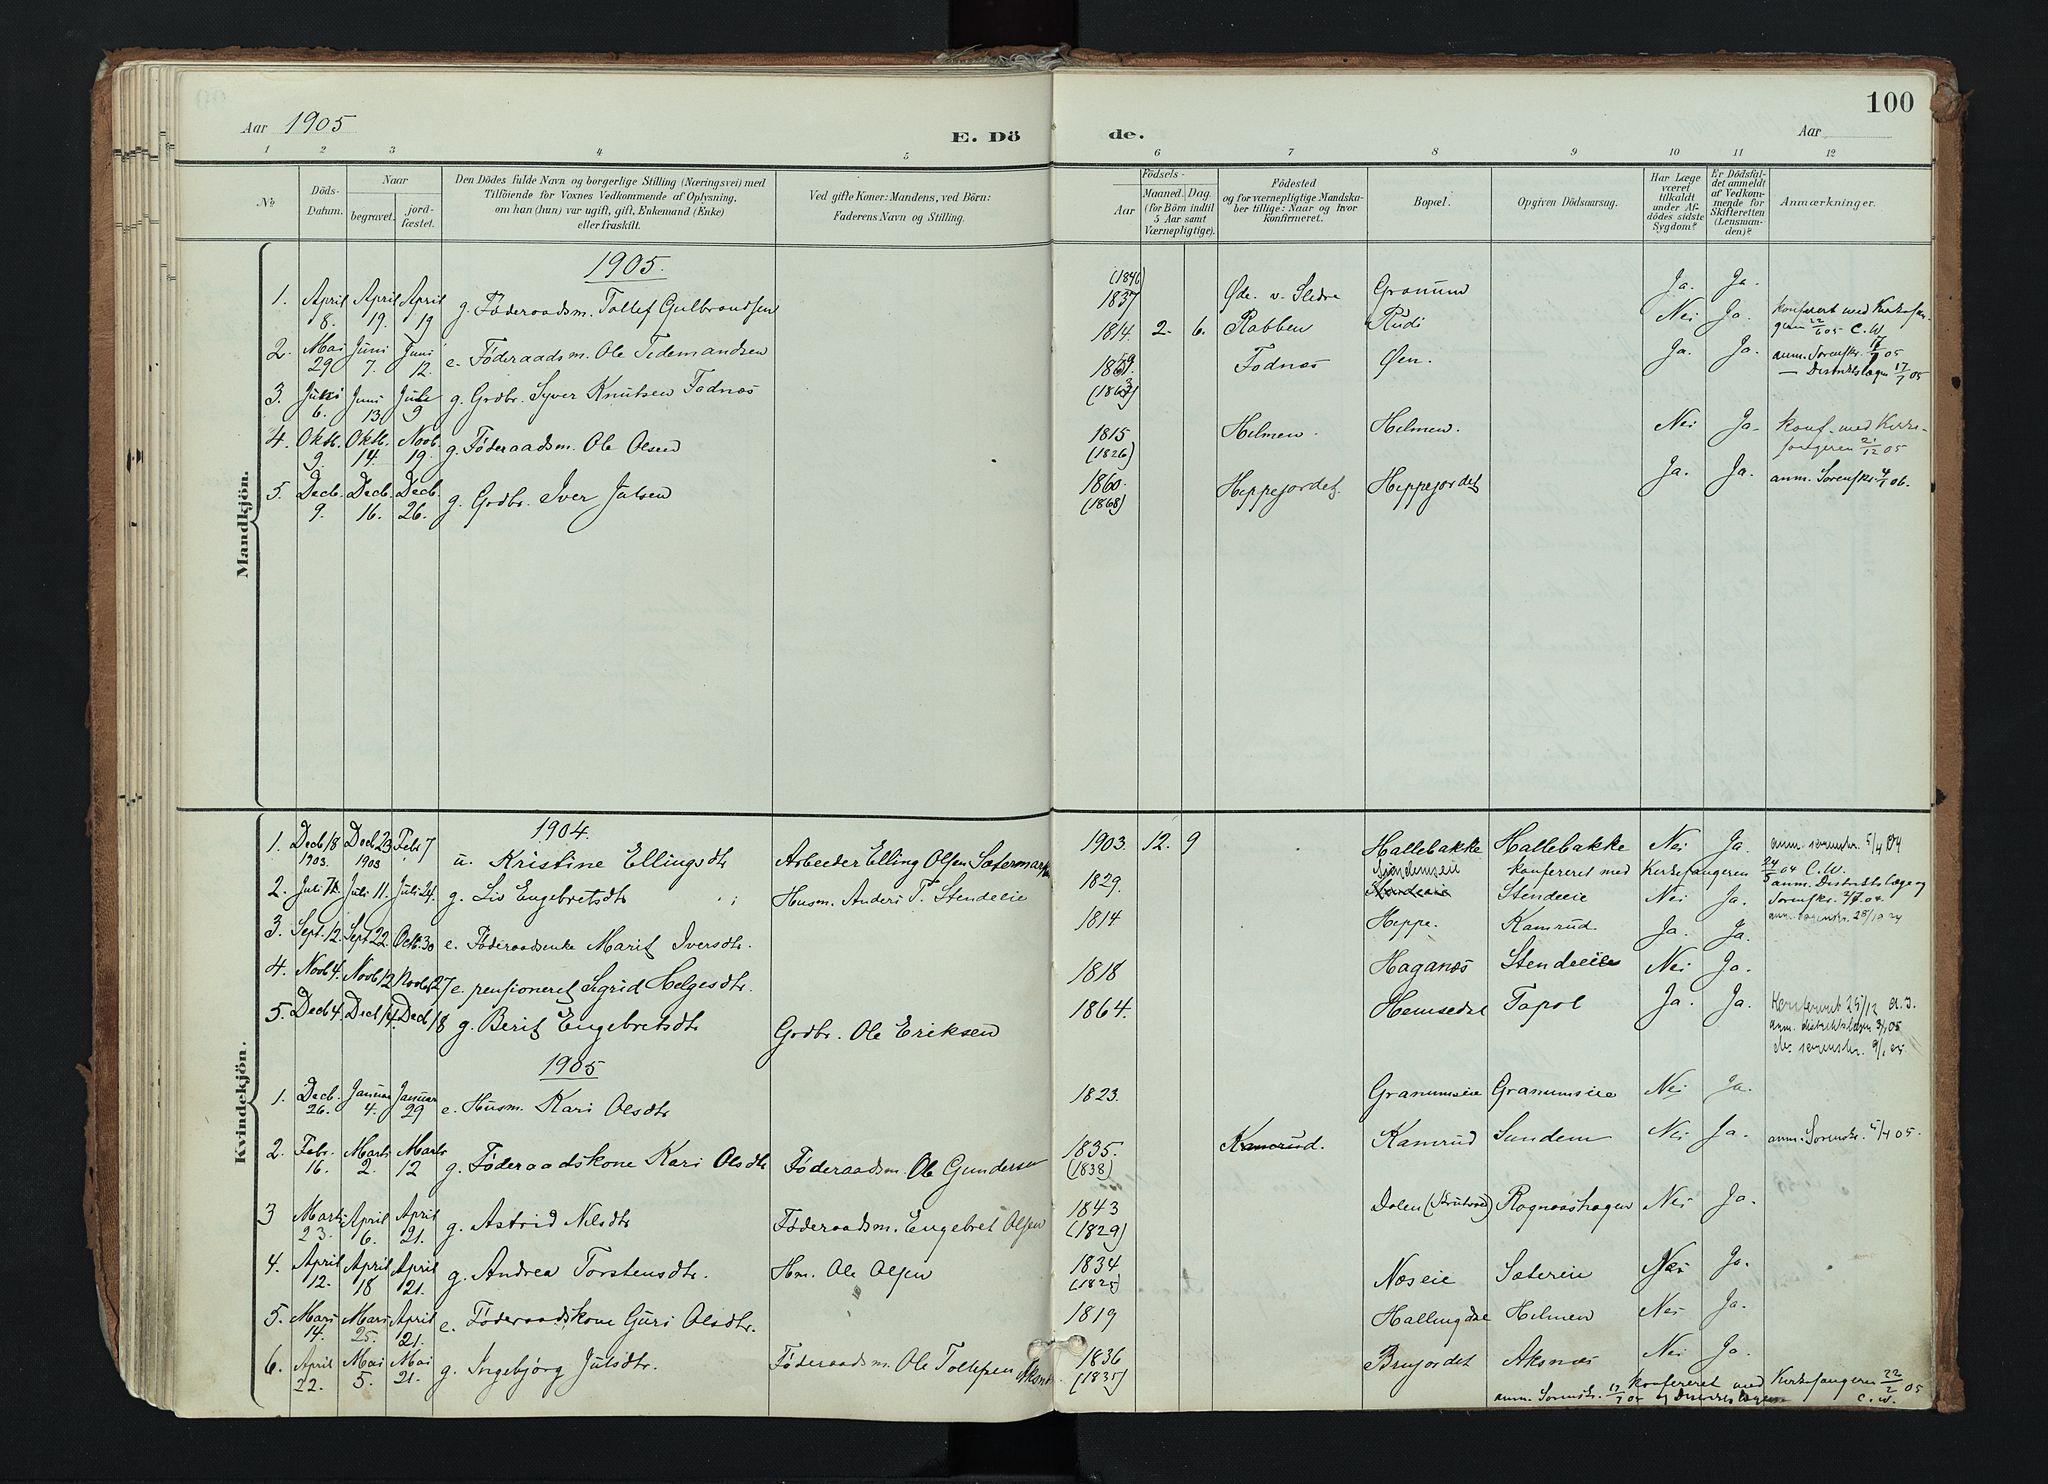 SAH, Nord-Aurdal prestekontor, Ministerialbok nr. 17, 1897-1926, s. 100